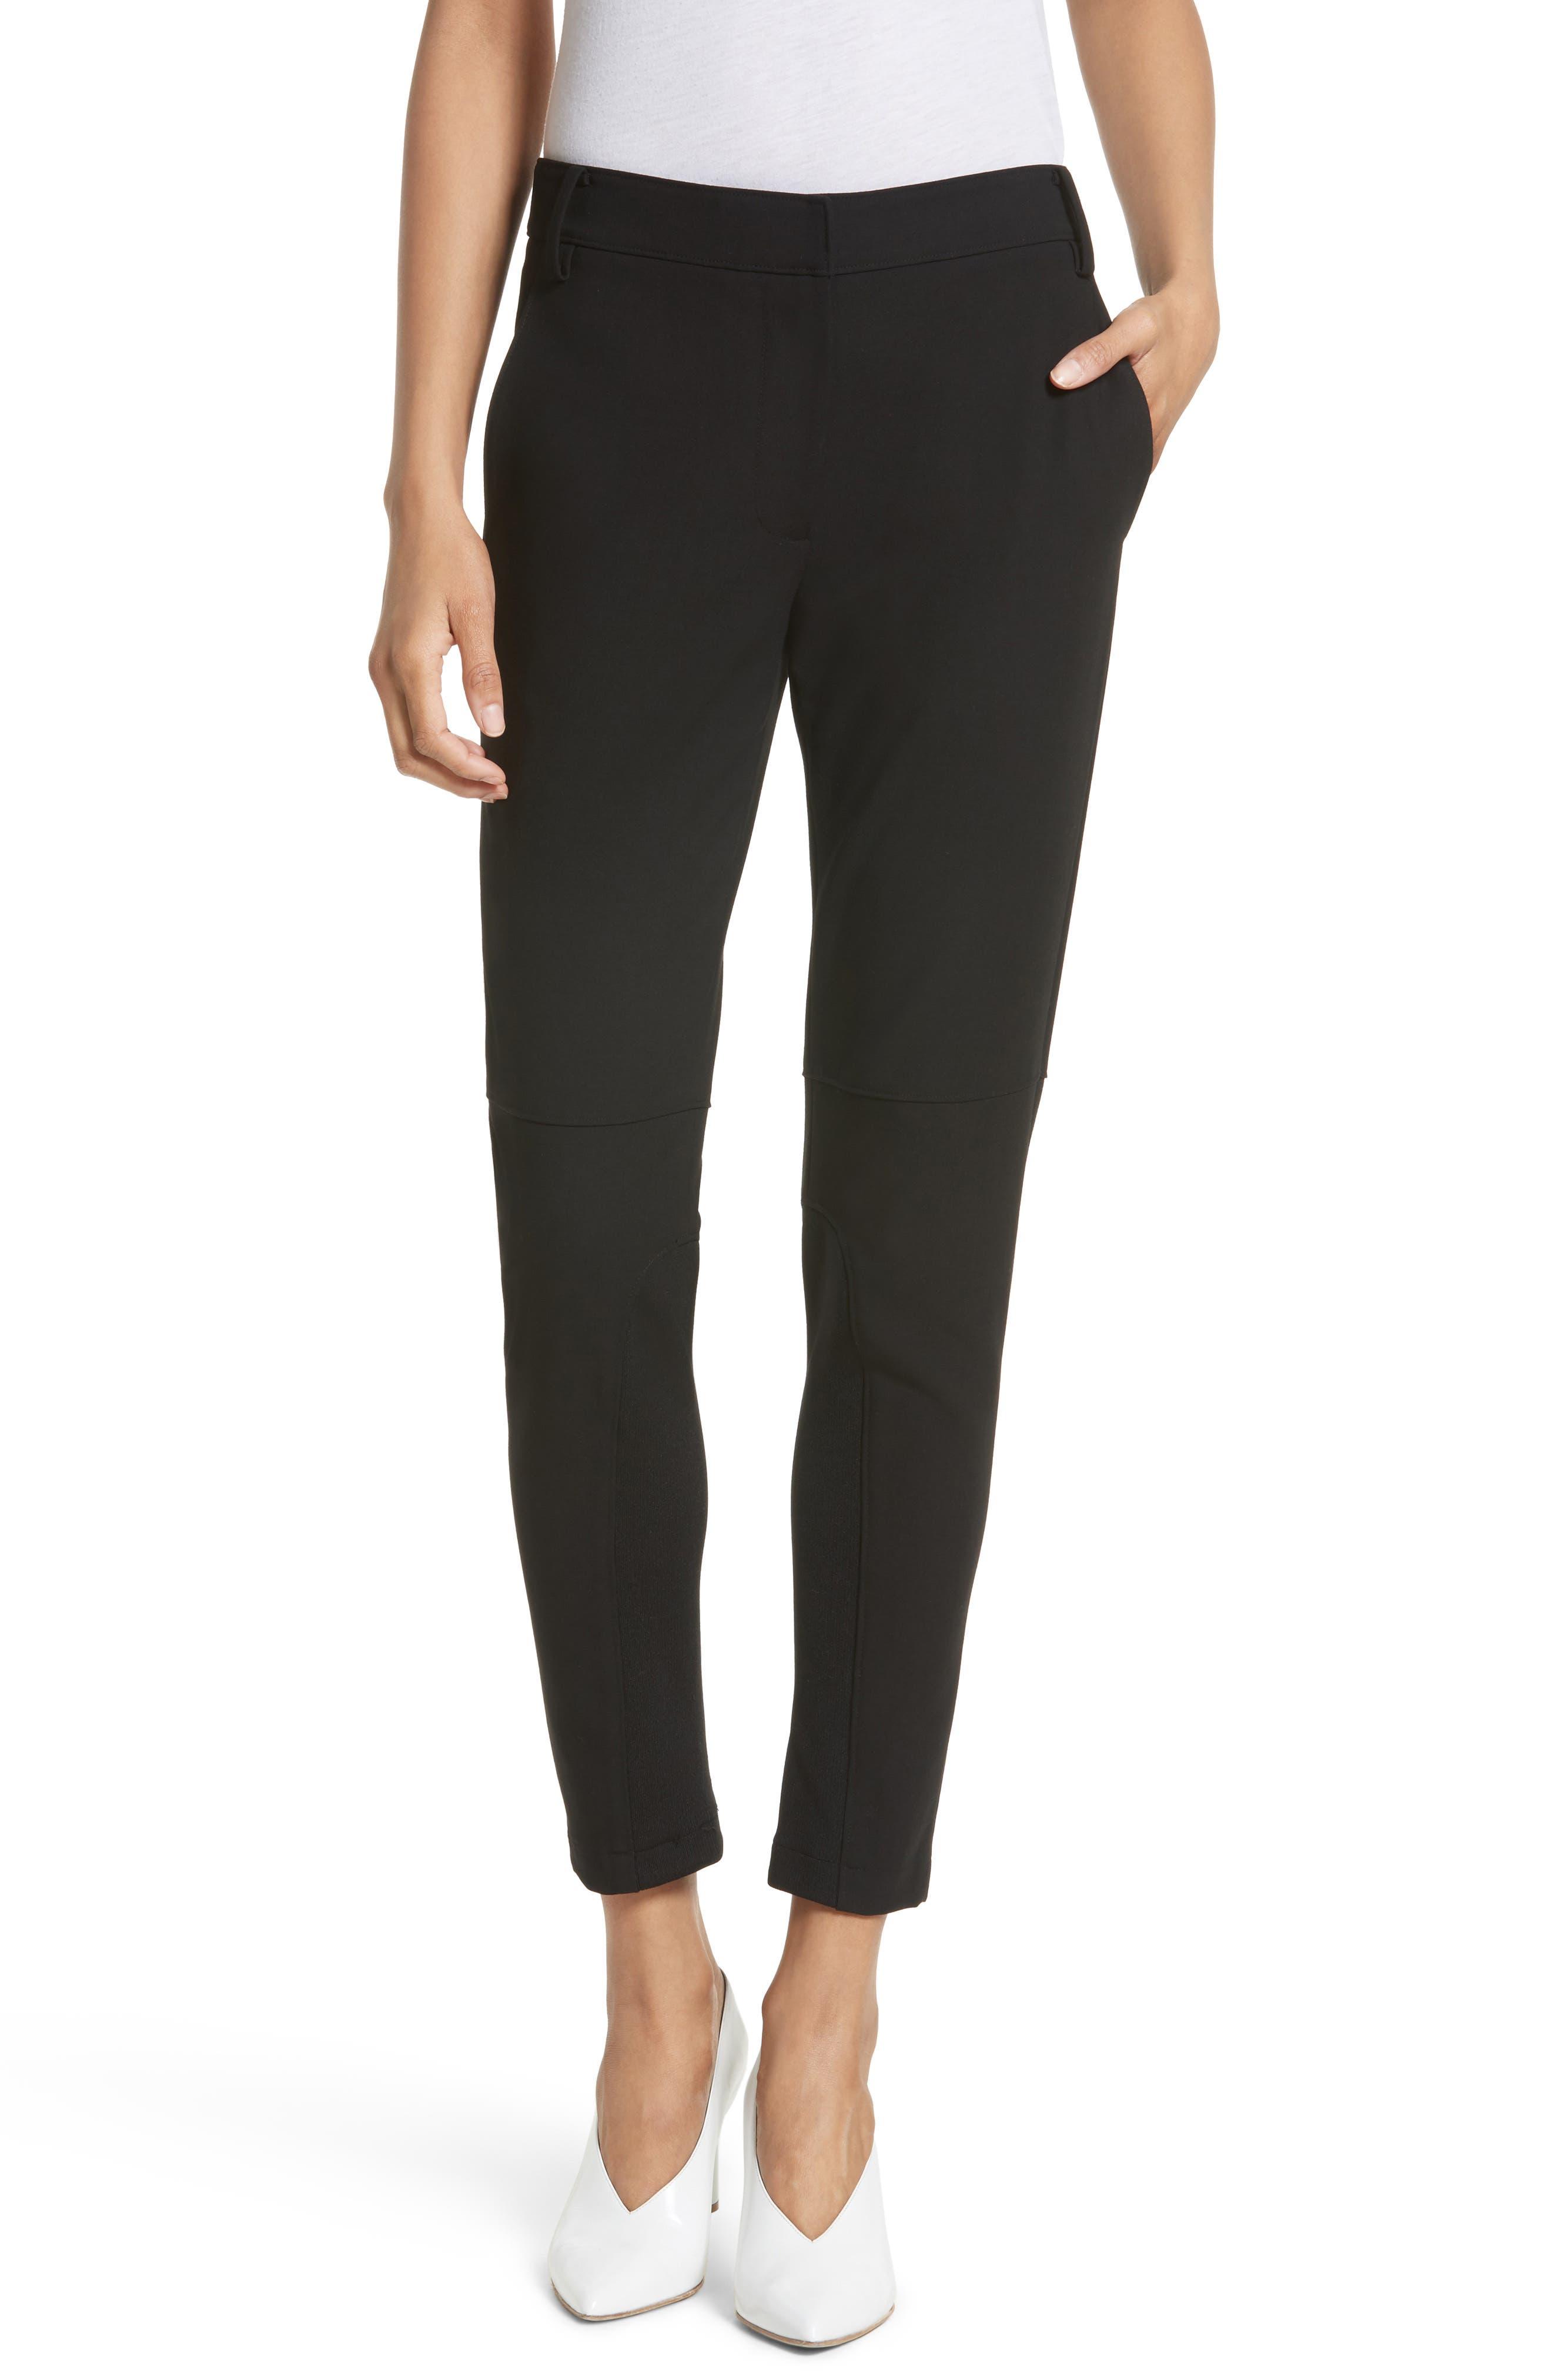 Anson Stretch Insert Ankle Pants,                         Main,                         color, Black